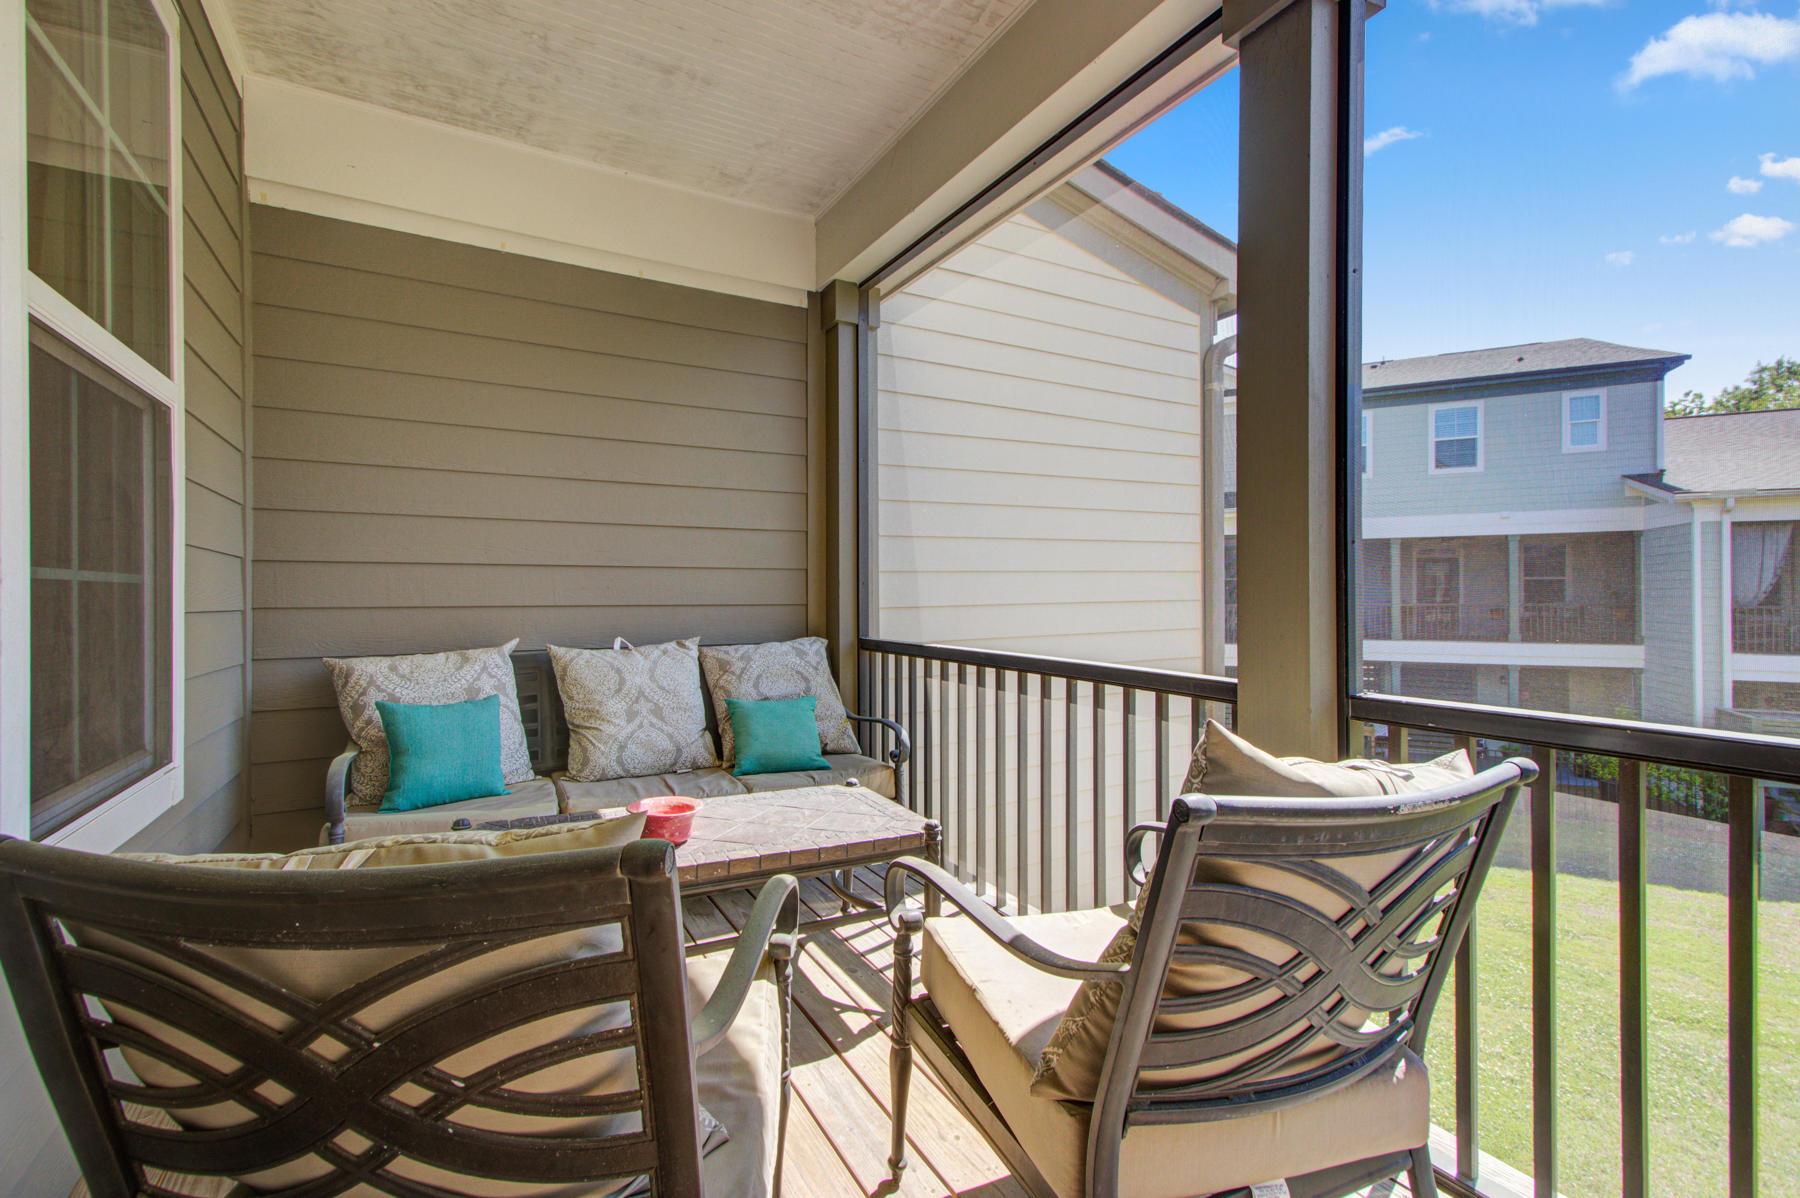 Etiwan Pointe Homes For Sale - 254 Slipper Shell, Mount Pleasant, SC - 38